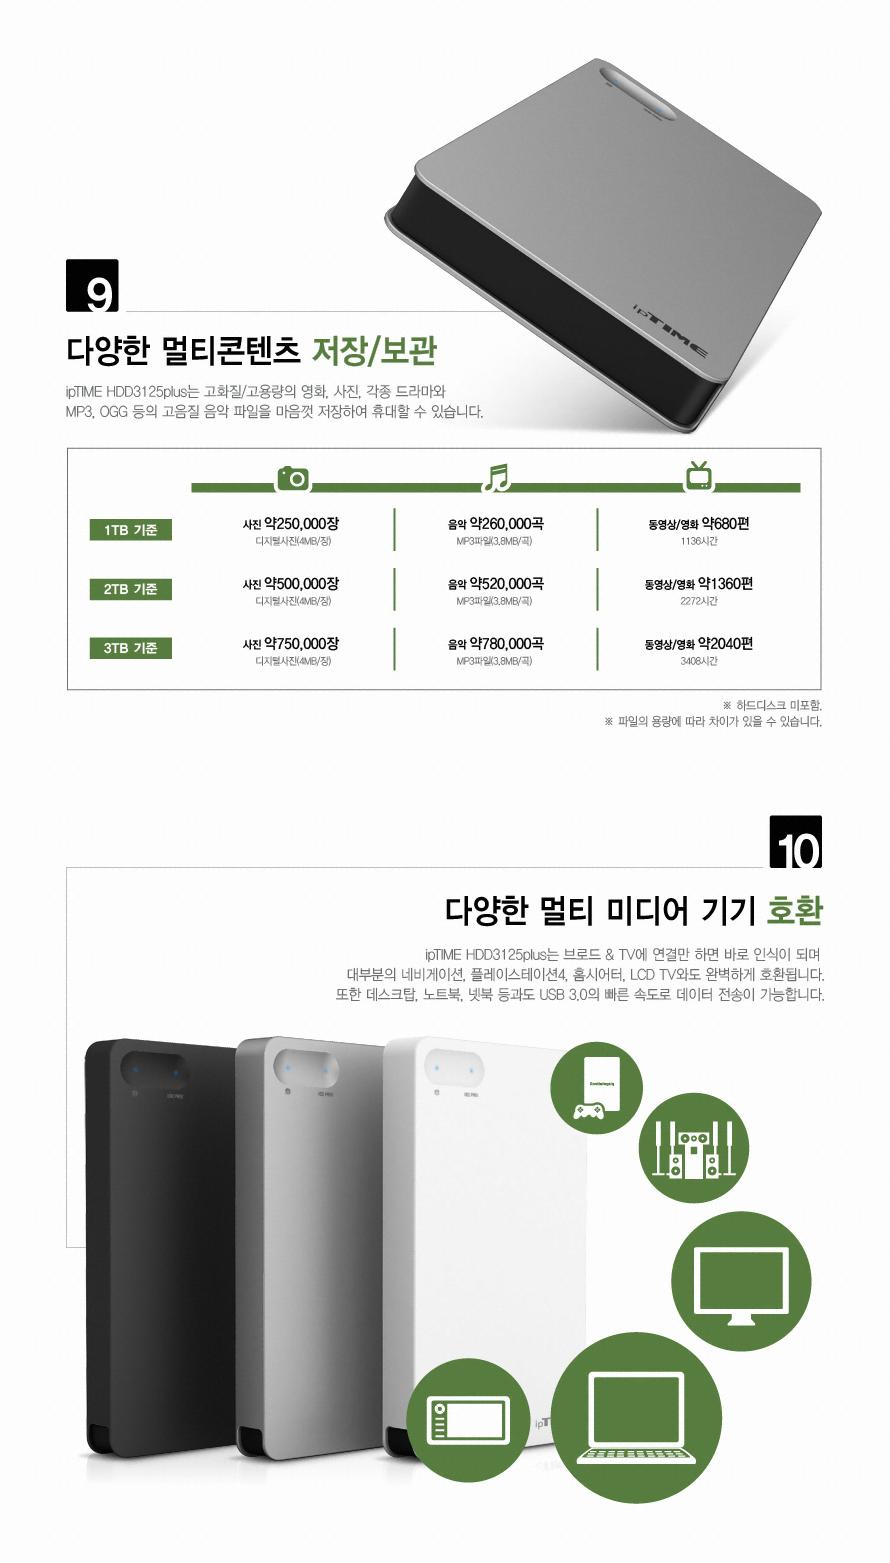 EFM ipTIME HDD 3125 Plus(1TB)